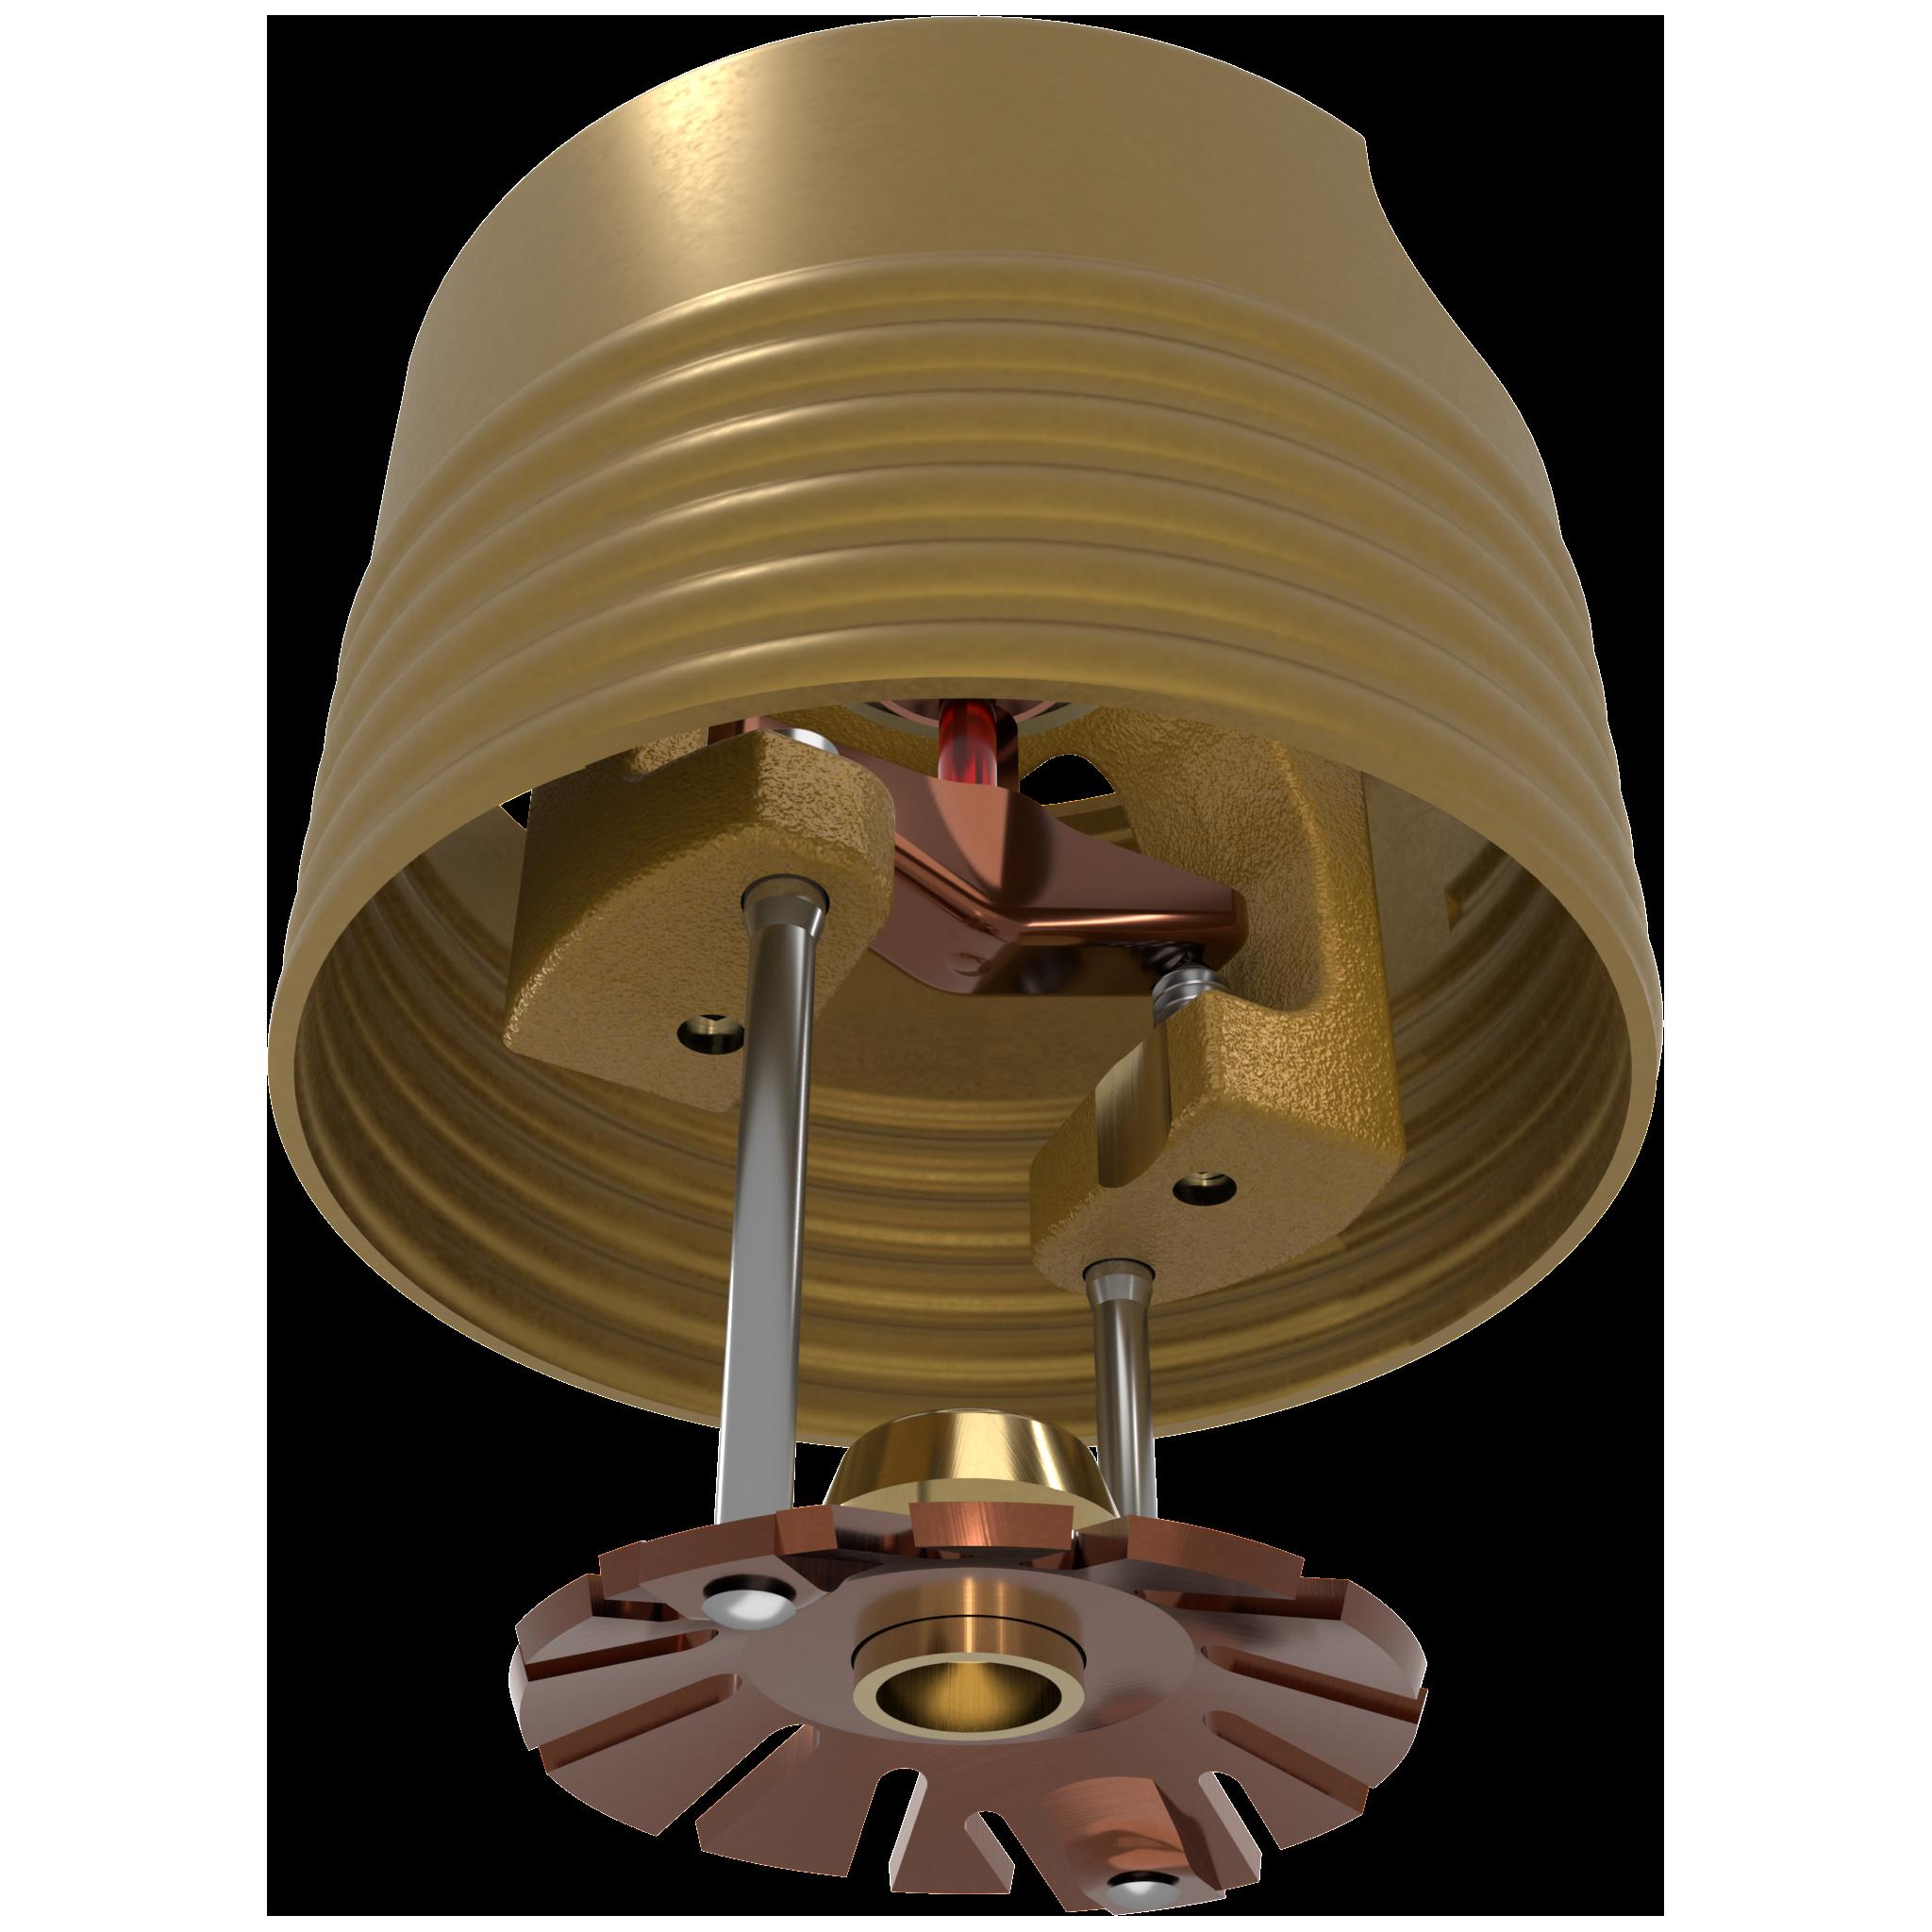 VK462, VK464 - Mirage® QR Concealed Pendent MRI Sprinklers (NON-FERROUS)